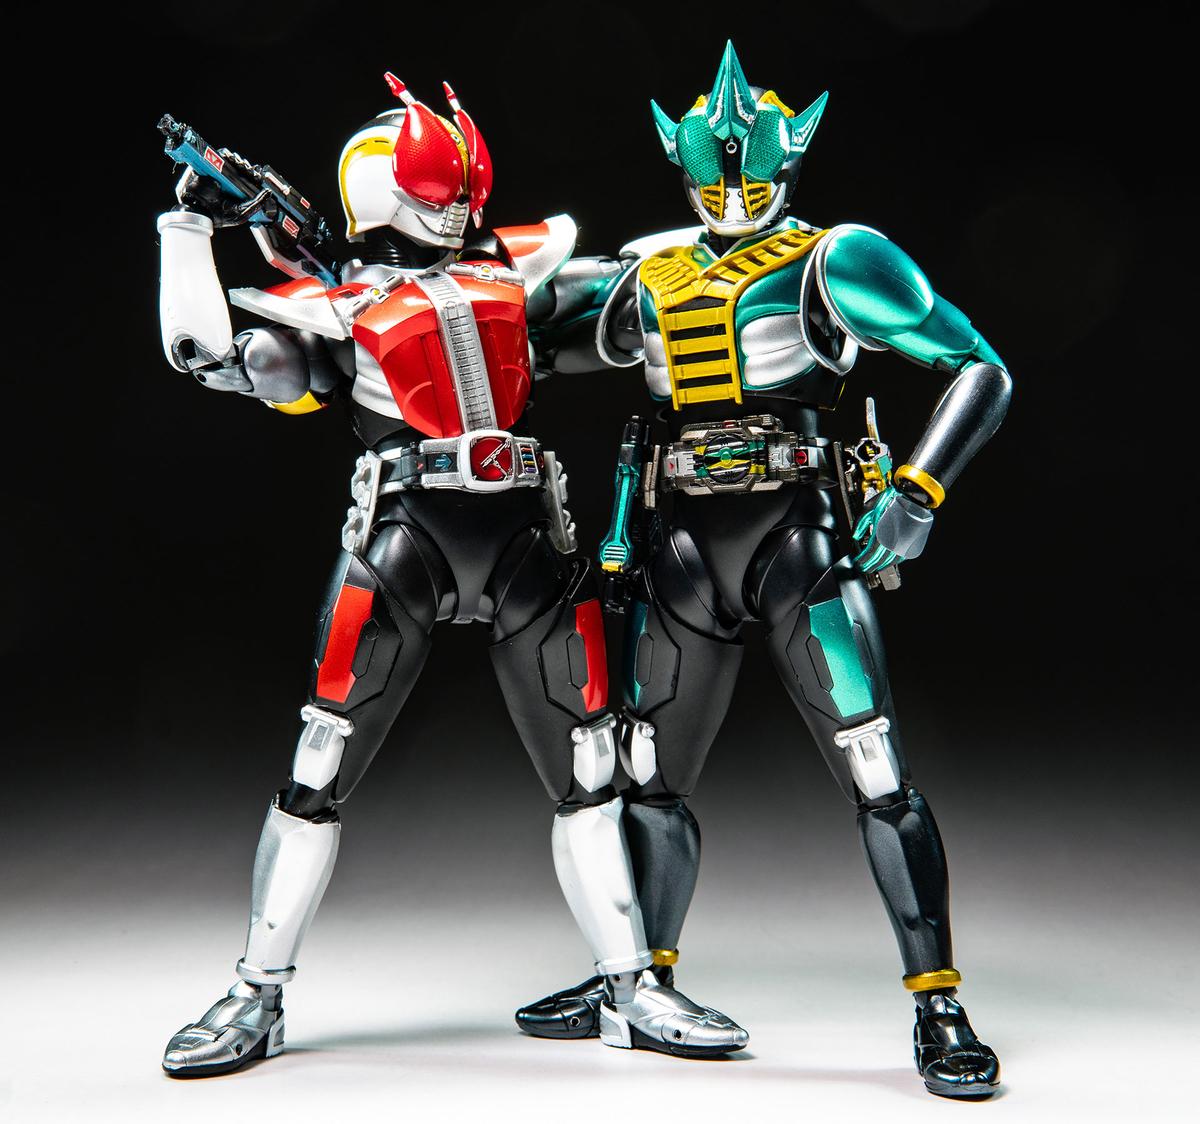 f:id:hiroban-ch:20210929215855j:plain